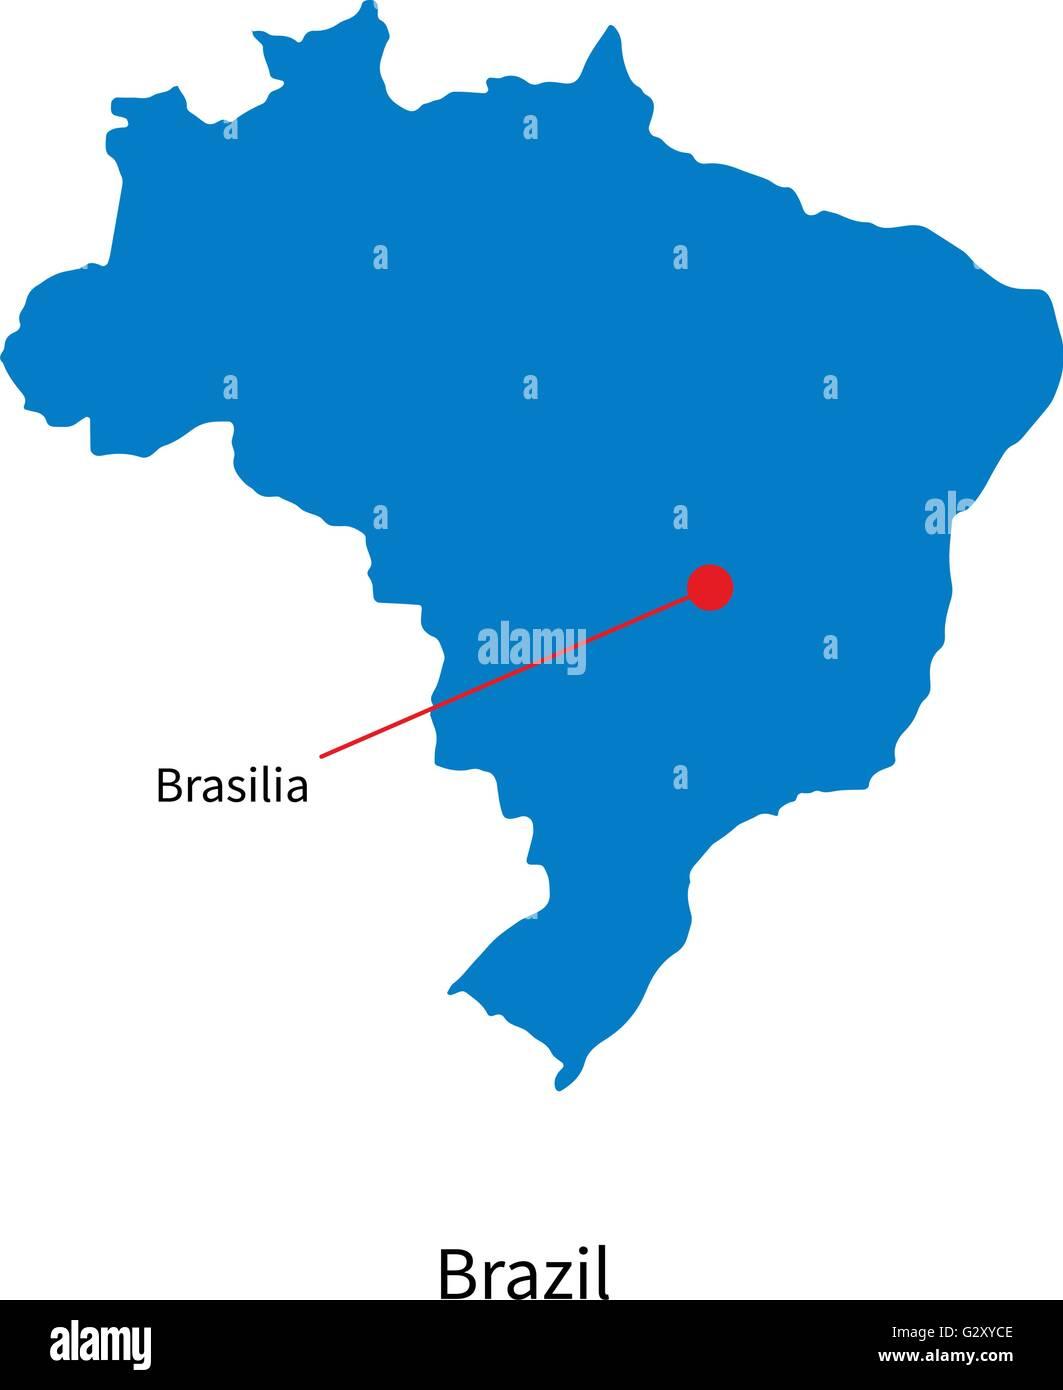 Capital Of Brazil Map Detailed vector map of Brazil and capital city Brasilia Stock